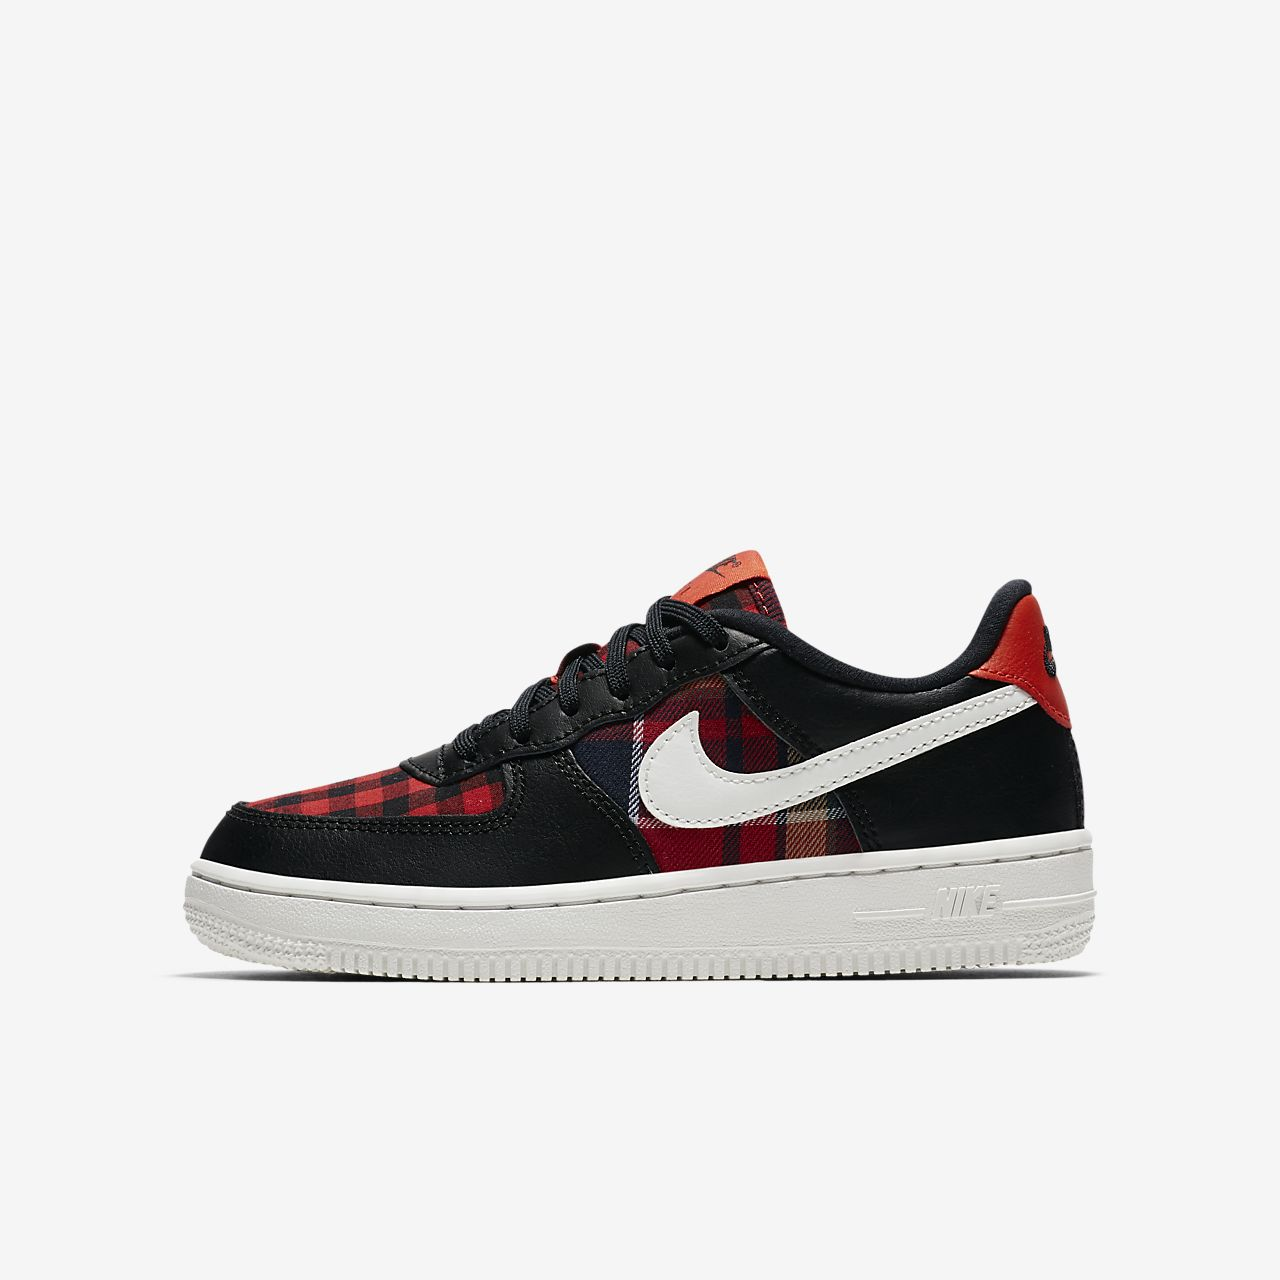 Nike Air Force 1 LV8 Little Kids' Shoe